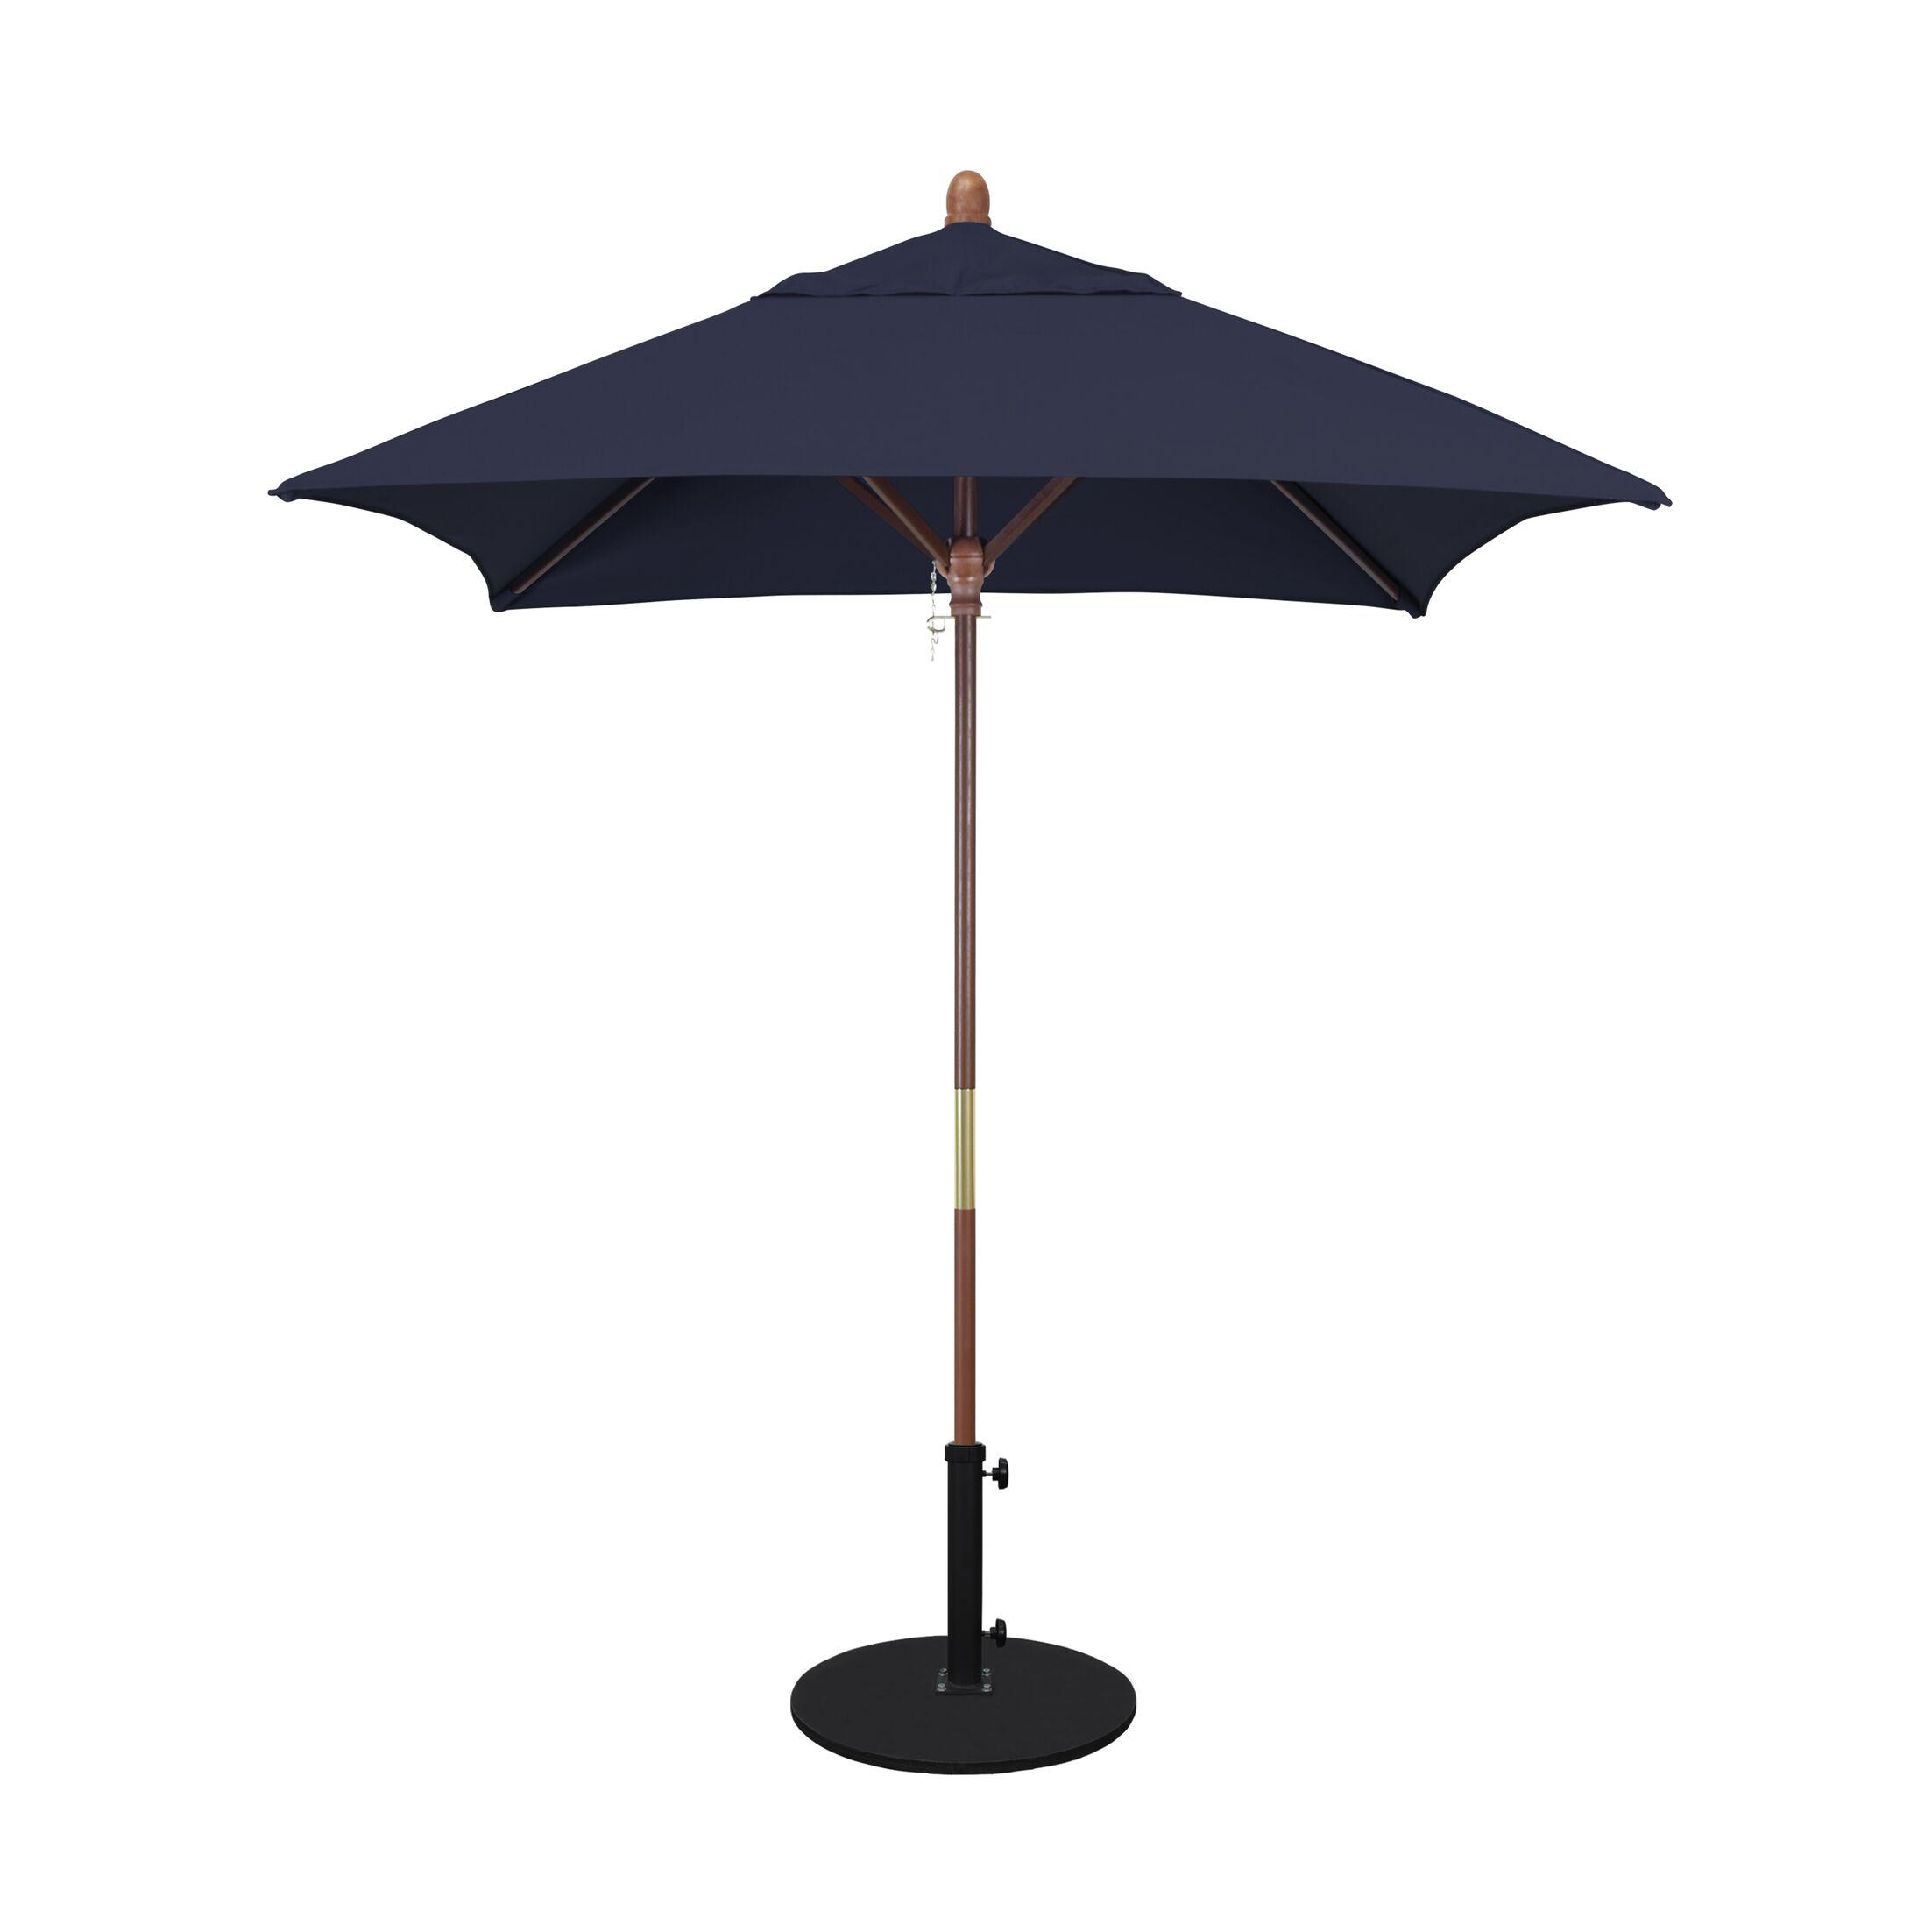 Burl 6' Square Market Umbrella Fabric: Sunbrella A Navy